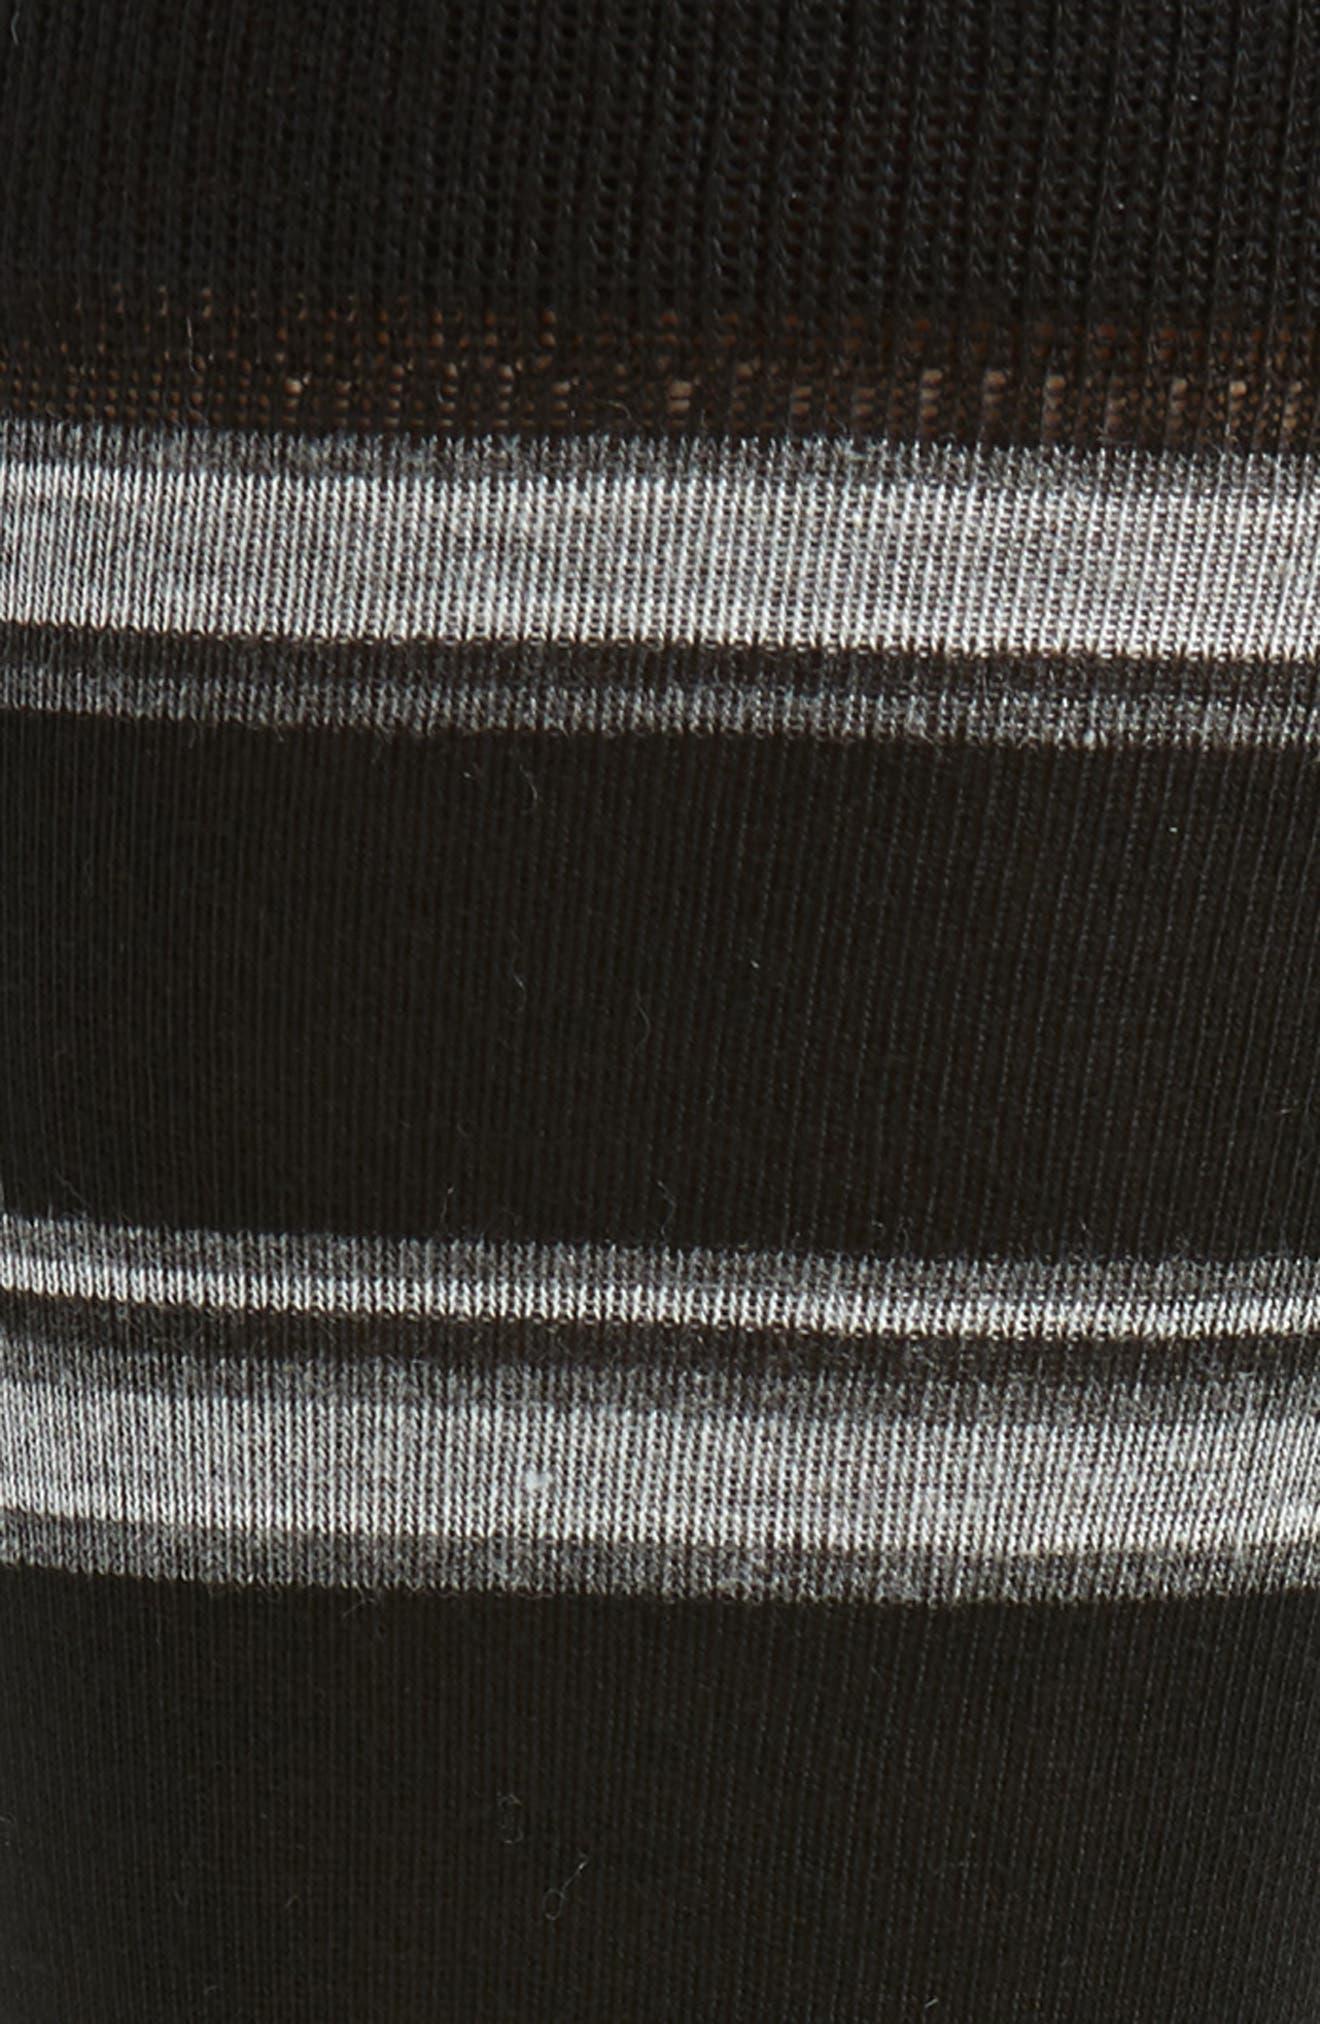 Alternating Rugby Stripe Socks,                             Alternate thumbnail 2, color,                             BLACK/ GREY